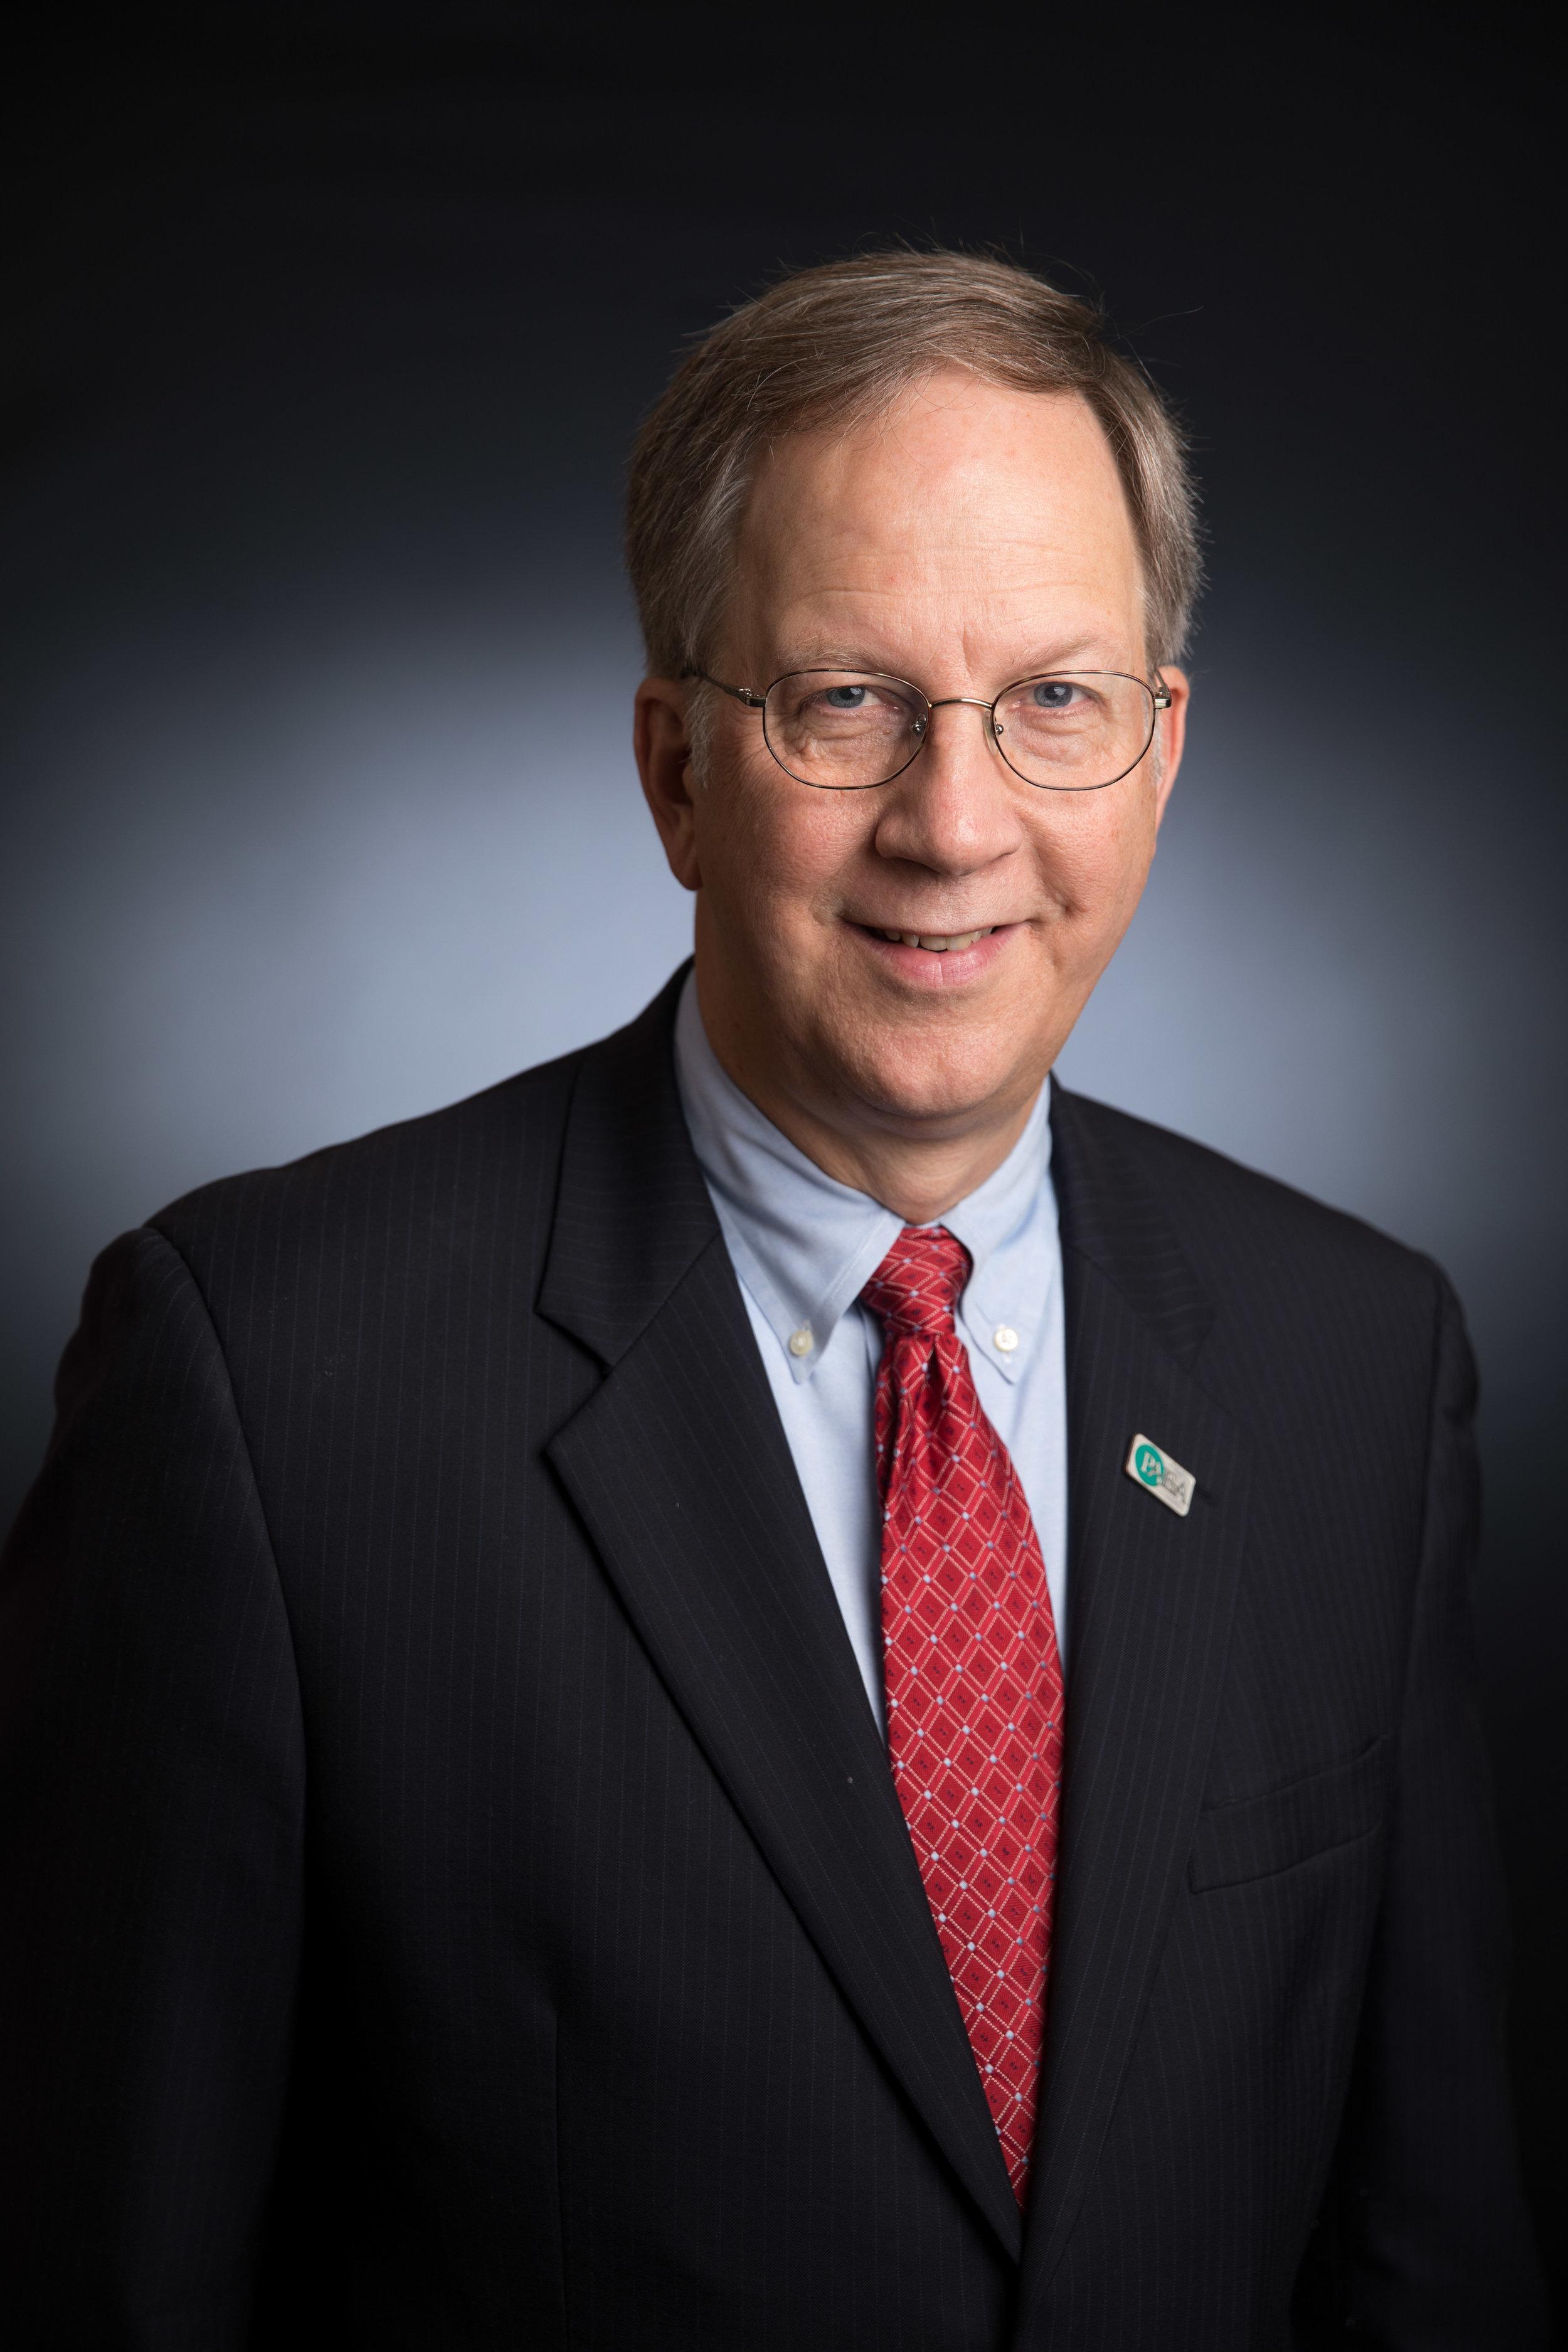 Dr. Bill Kohlhepp, President of PAEA, Dean of Health Sciences at Quinnipiac Univerisity